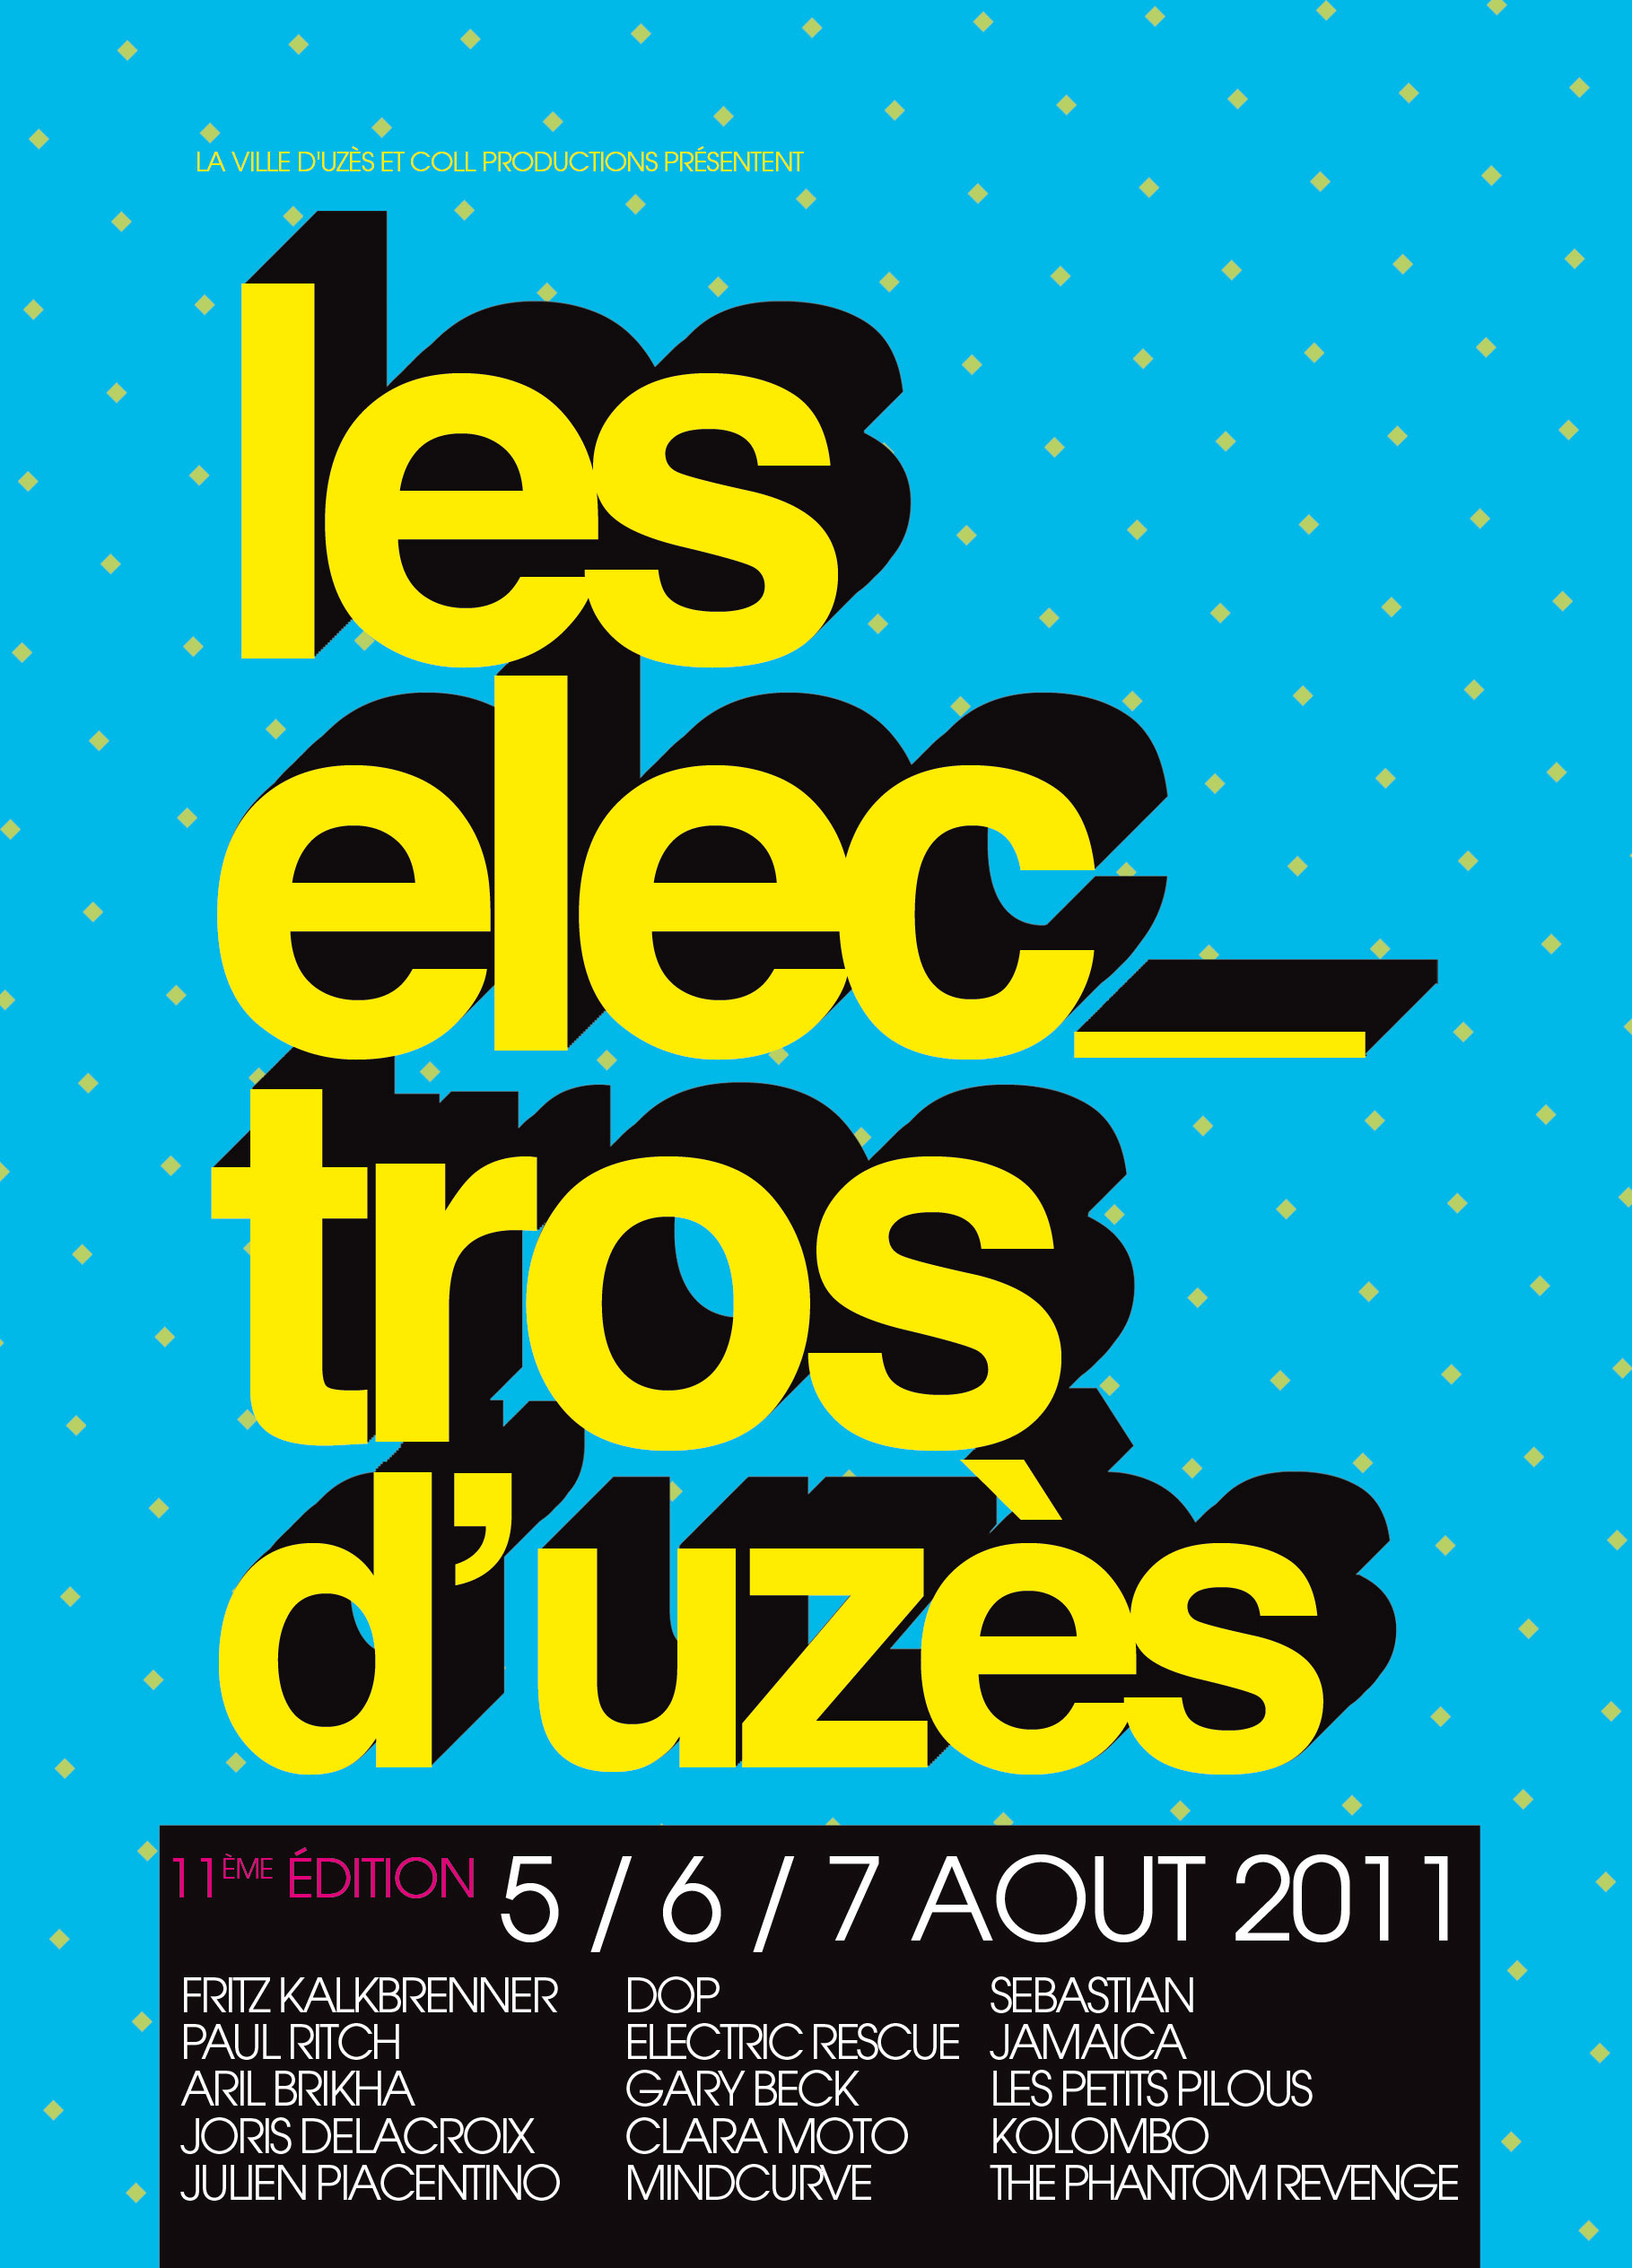 Uzes-2011-15x21-R-bleu.jpg